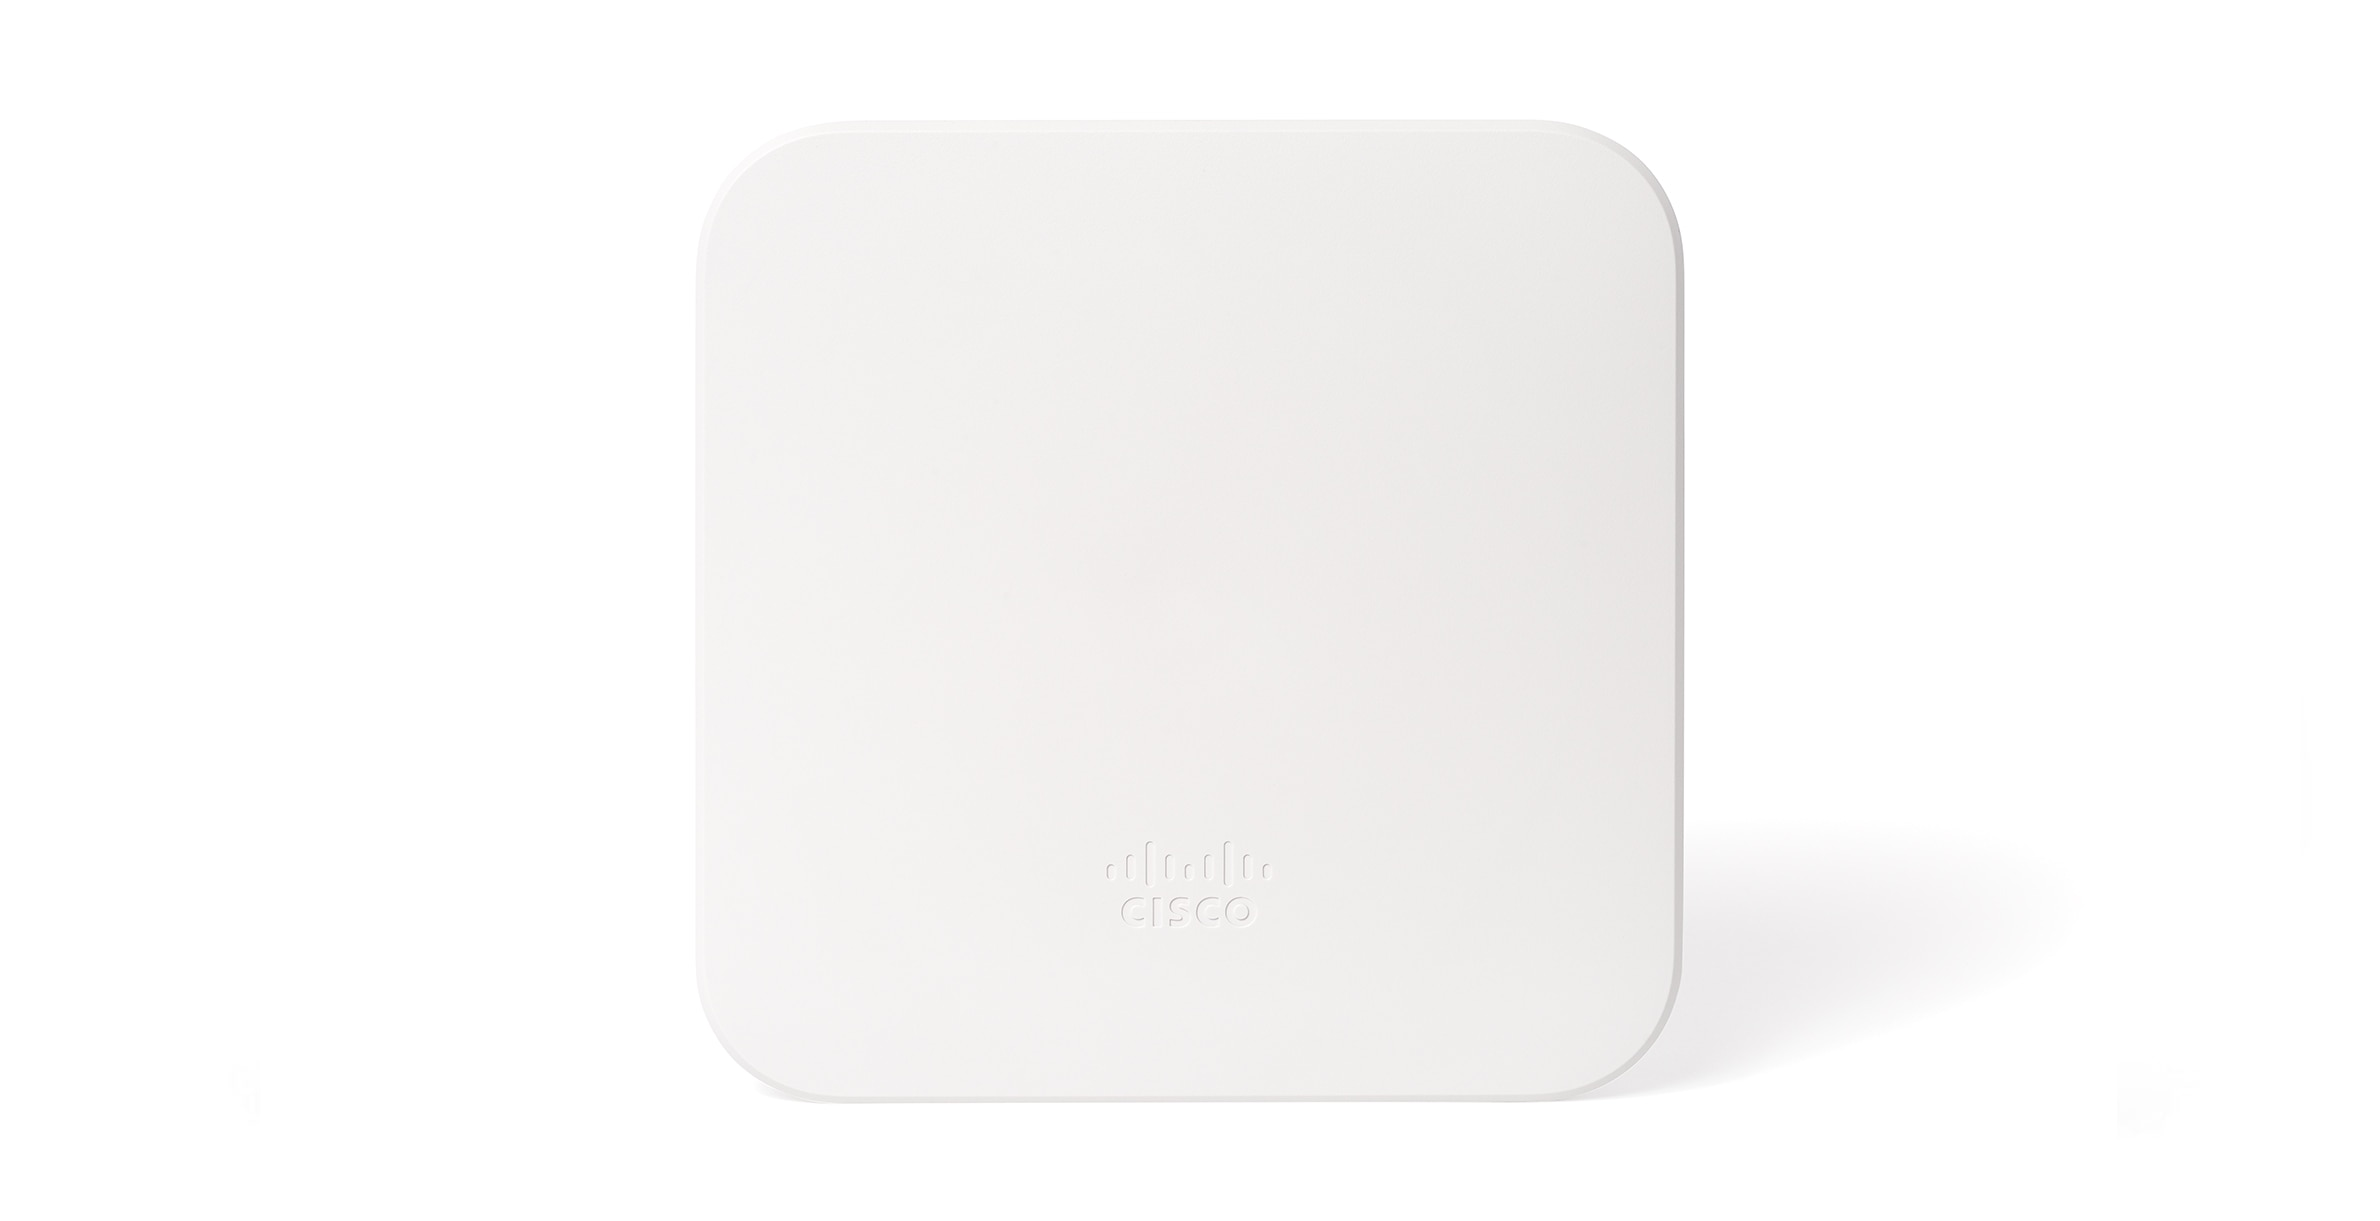 Cisco Meraki MG21 - wireless cellular modem